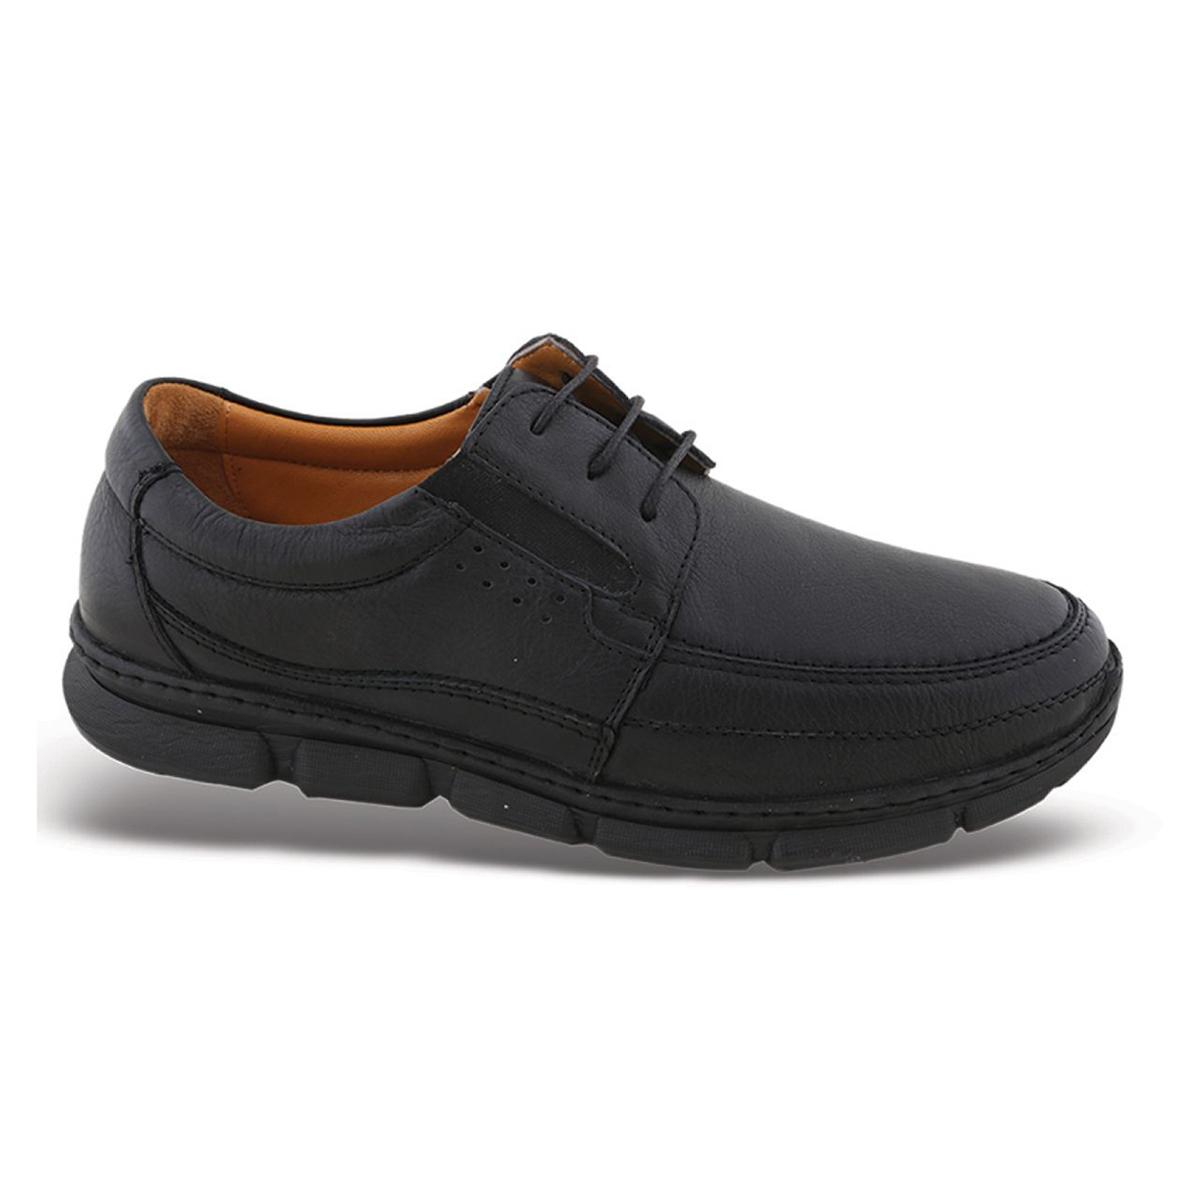 Casual ανδρικά παπούτσια Νο 205 - Μαύρα